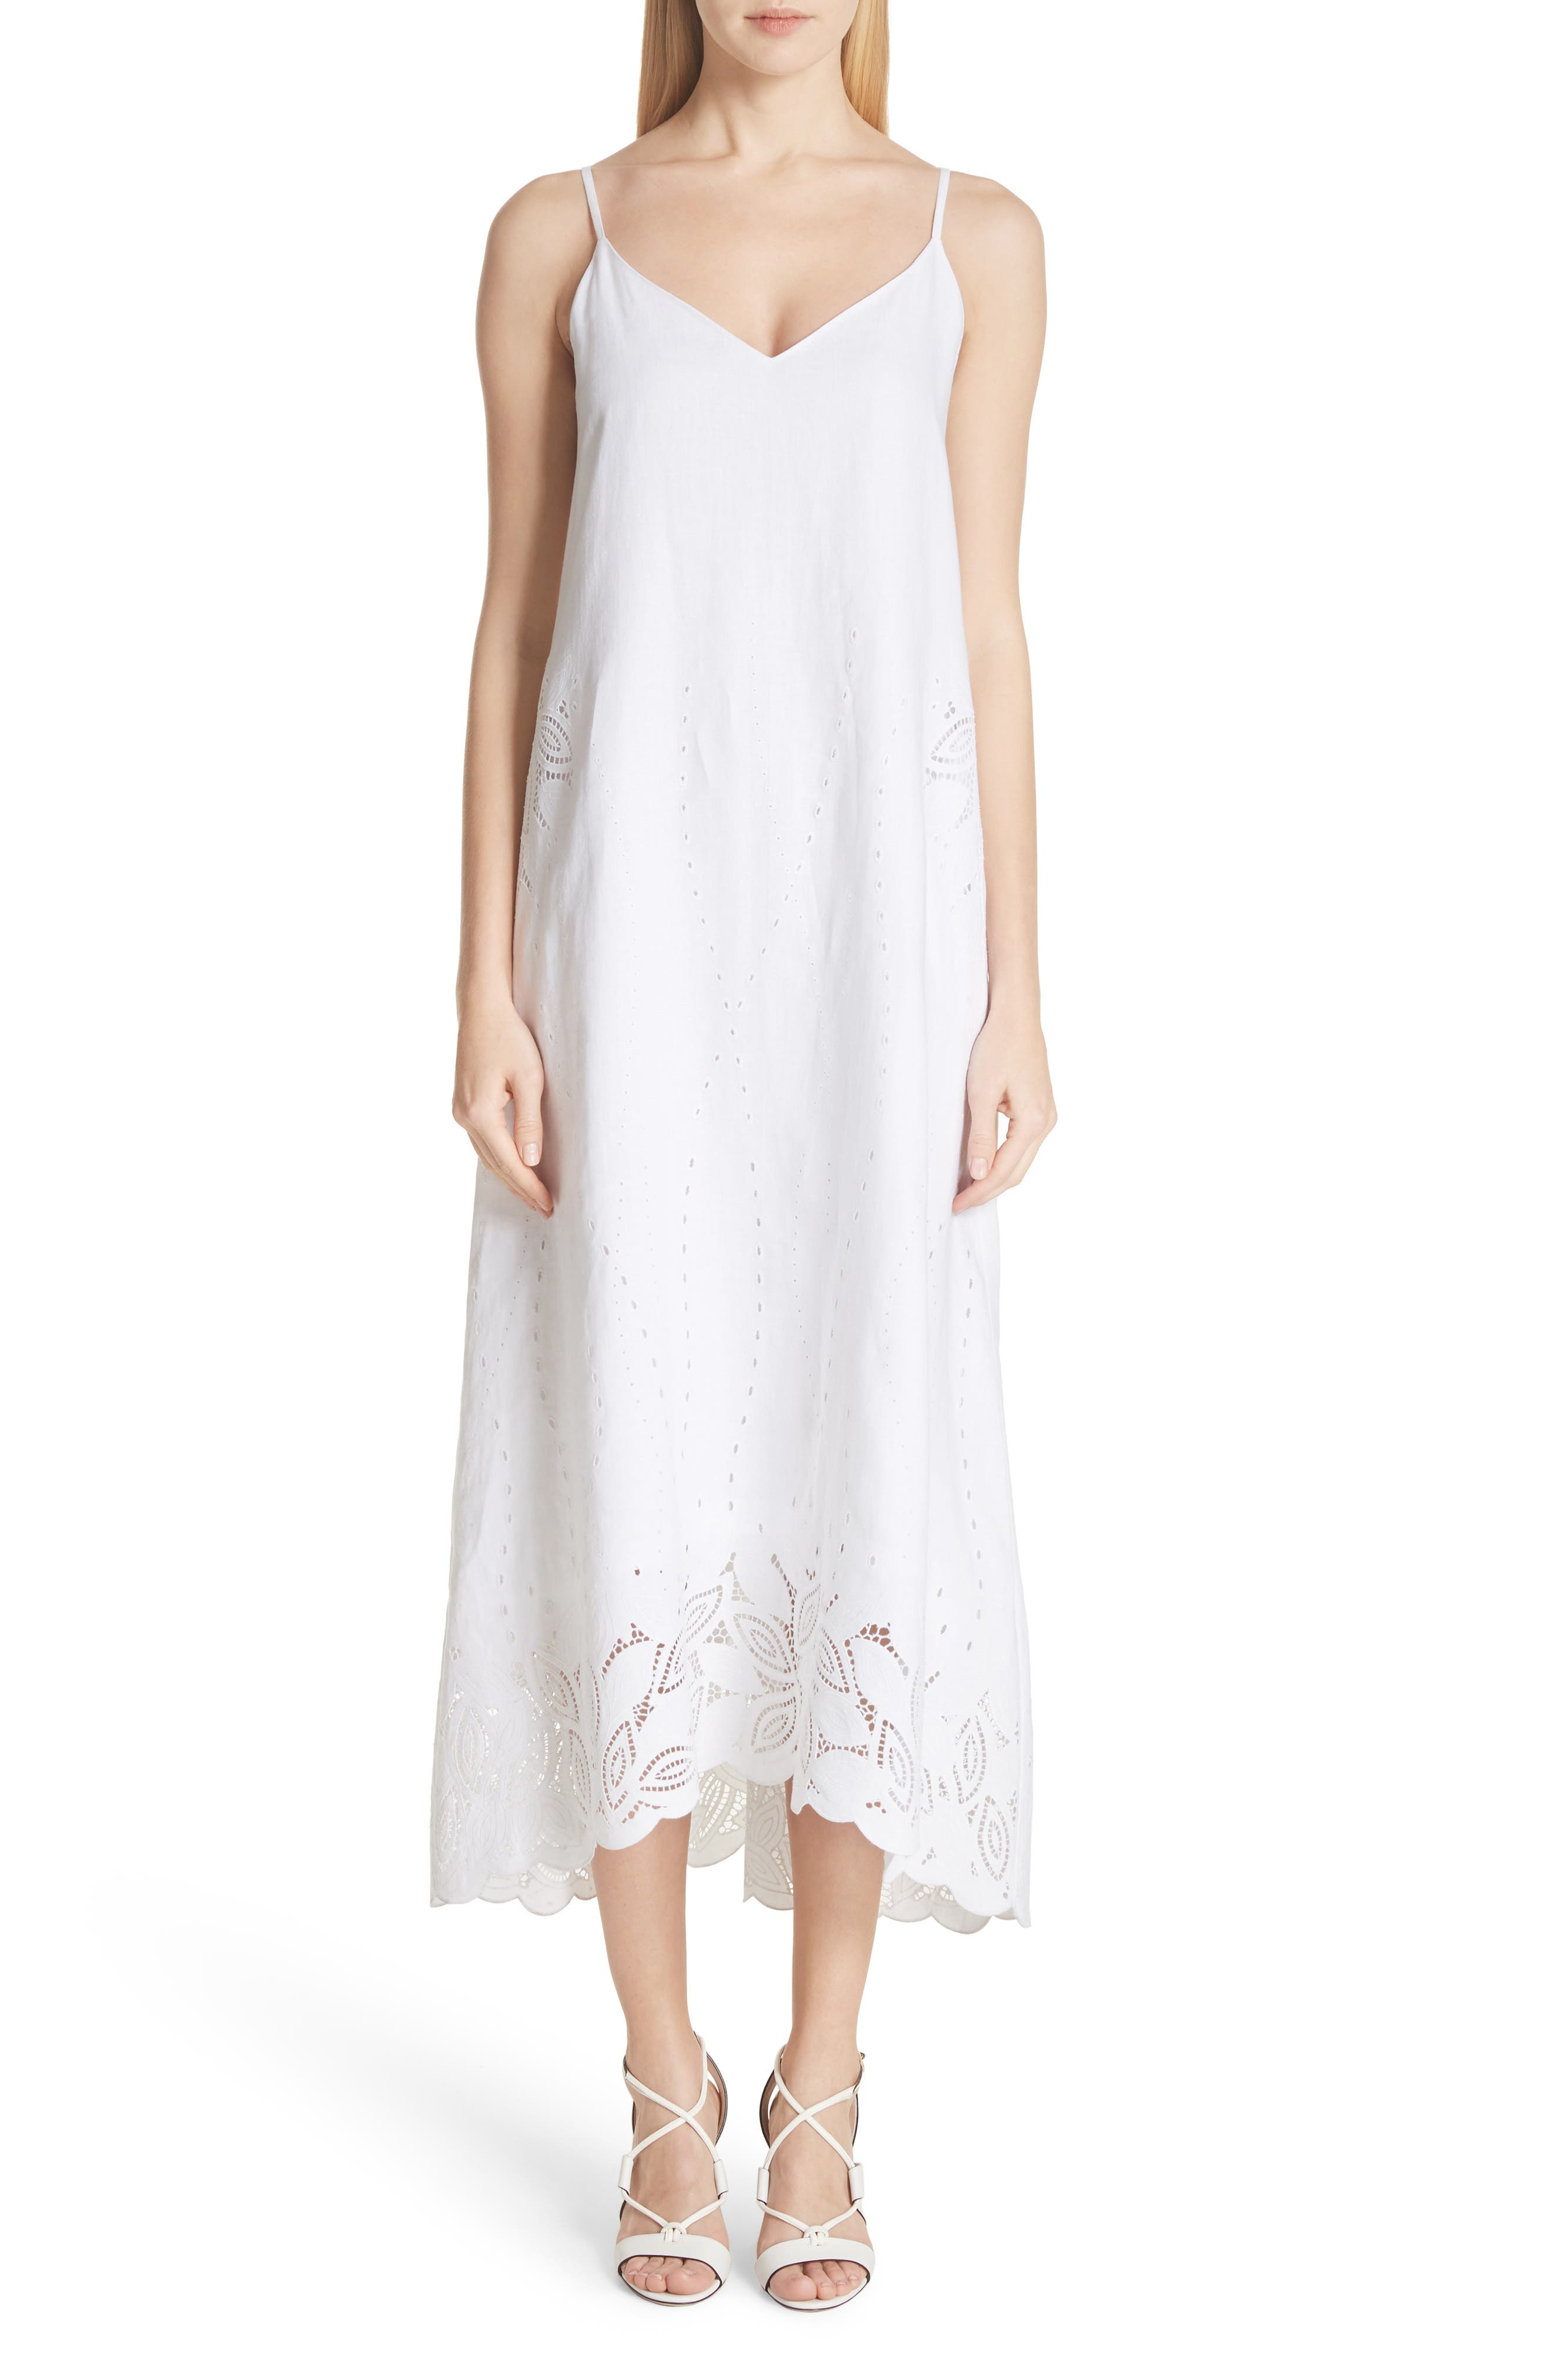 Dominique Linen Cutwork Dress,                         Main,                         color, White